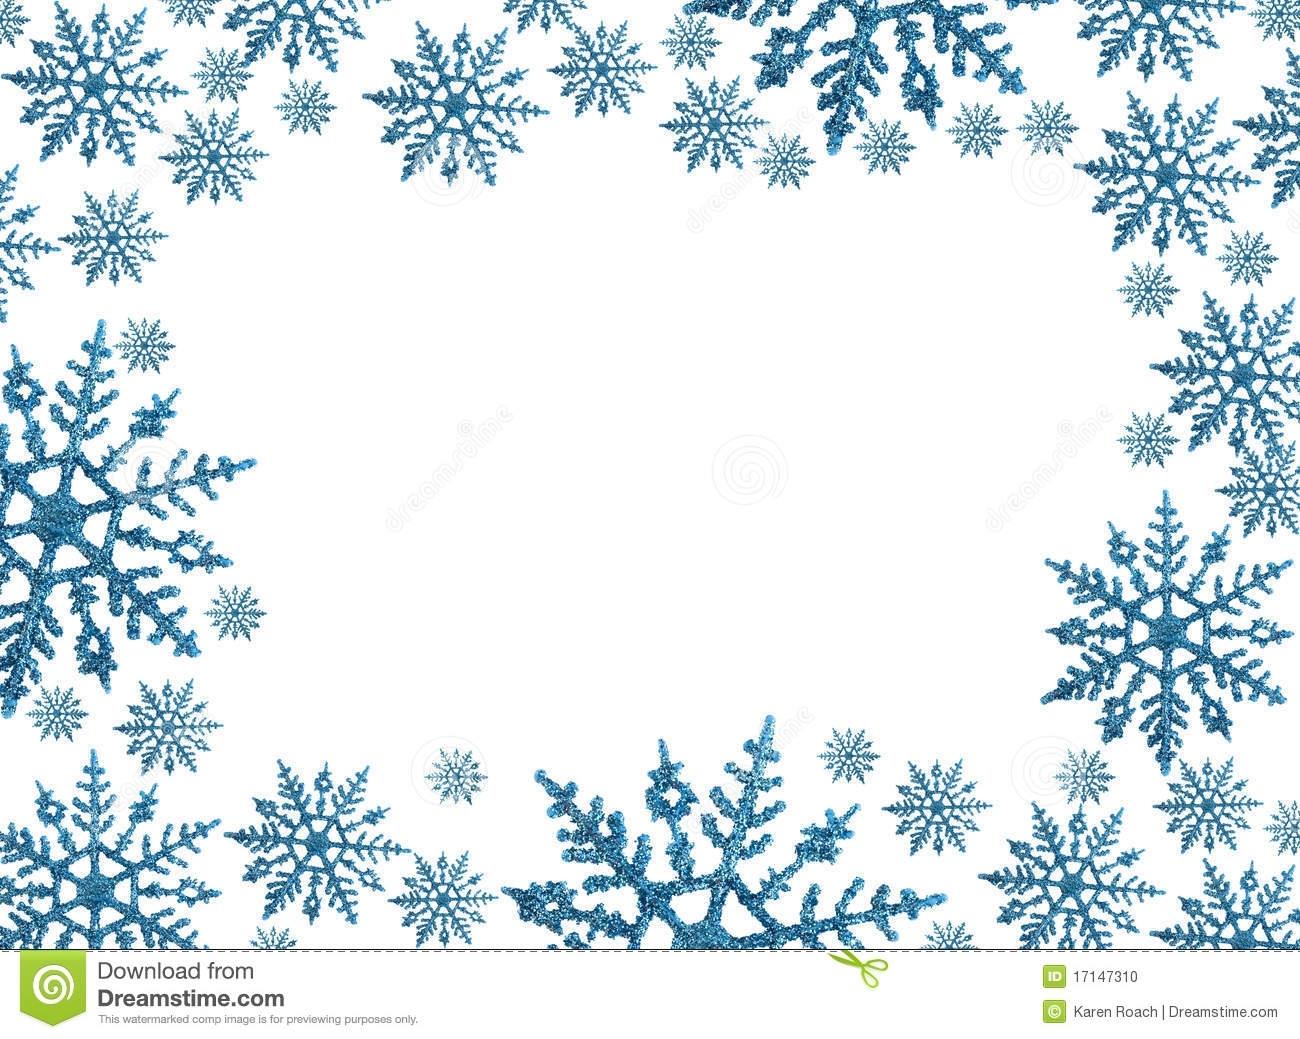 619 Snowflake Border free clipart.